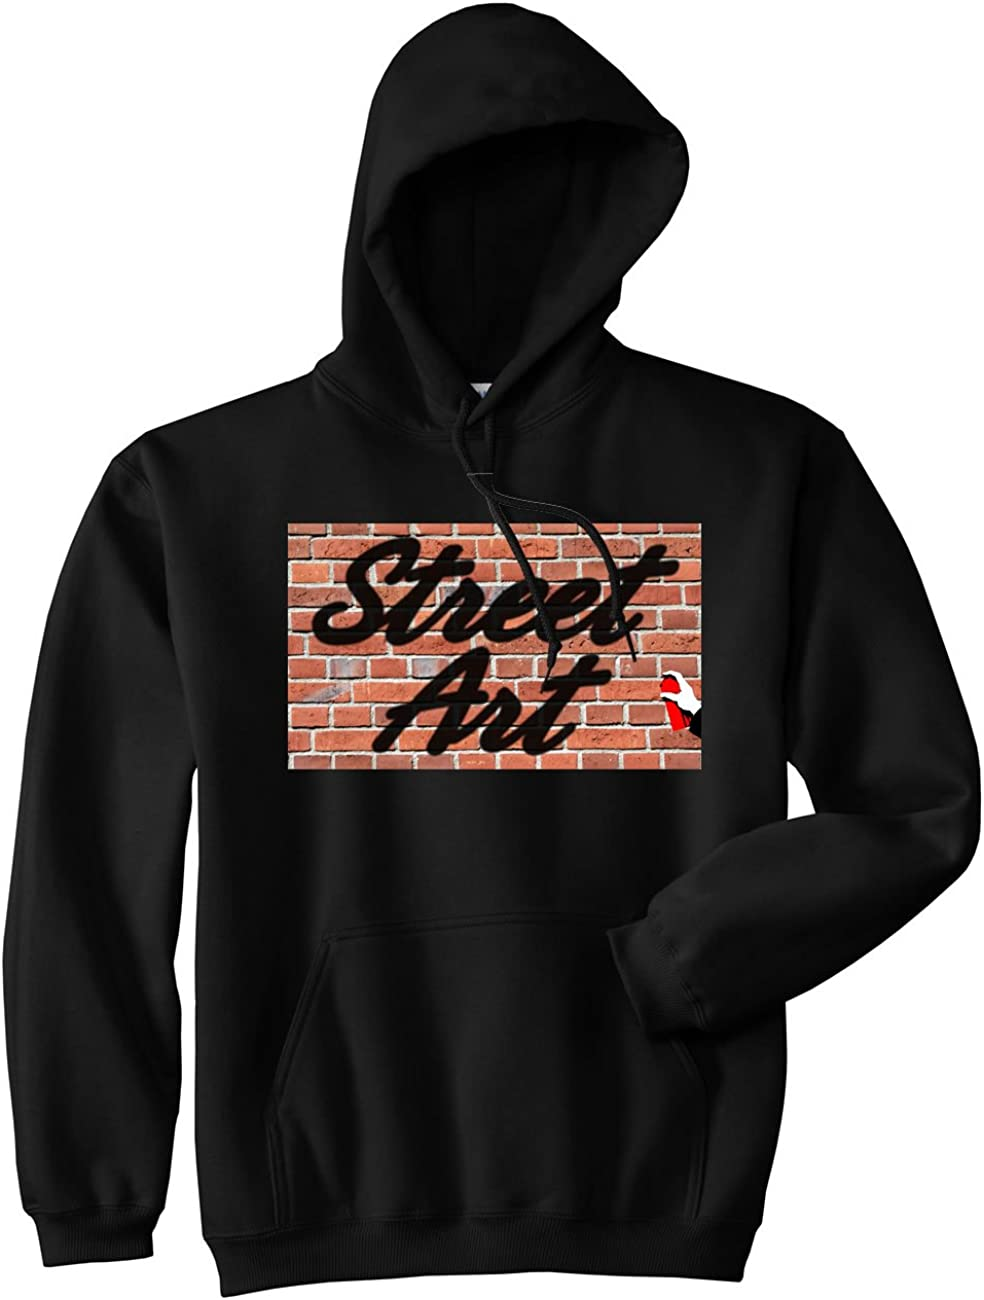 Kings Of NY Street Art Graffiti Spray Can Painting Pullover Hoody Sweatshirt